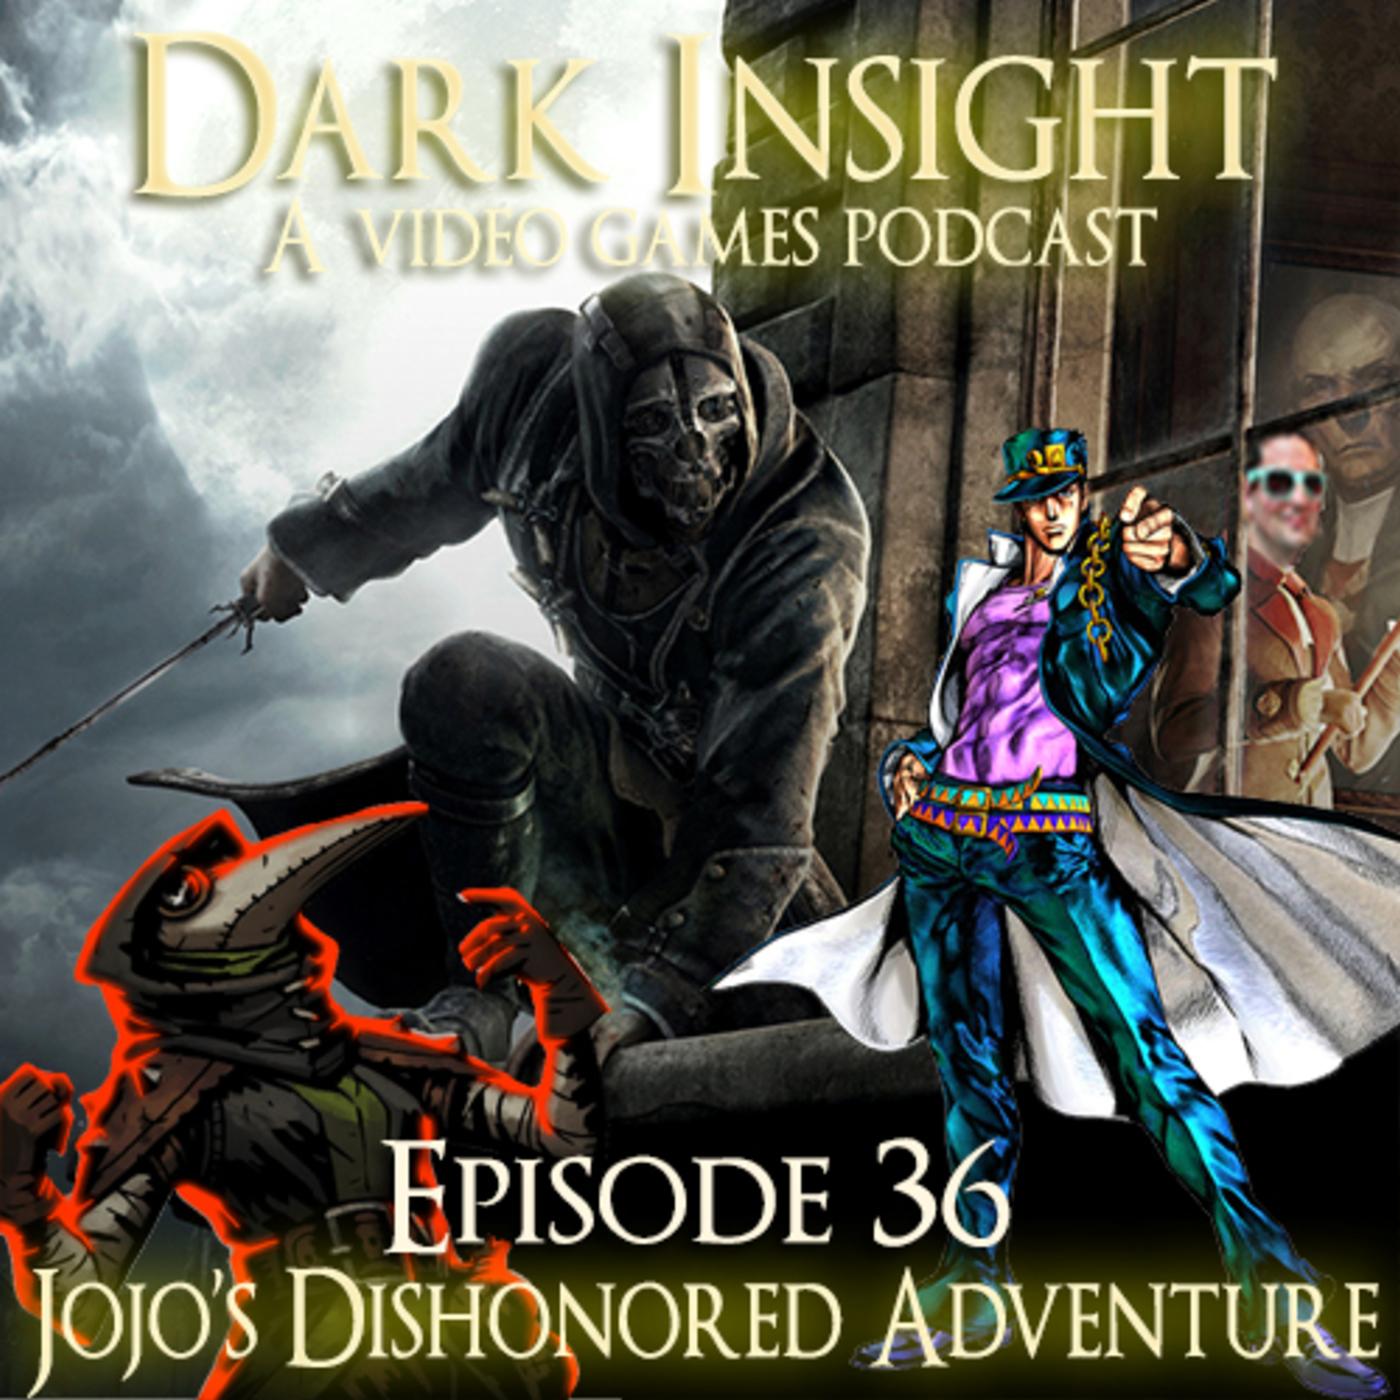 Dark Insight Episode 36: JoJo's Dishonored Adventure